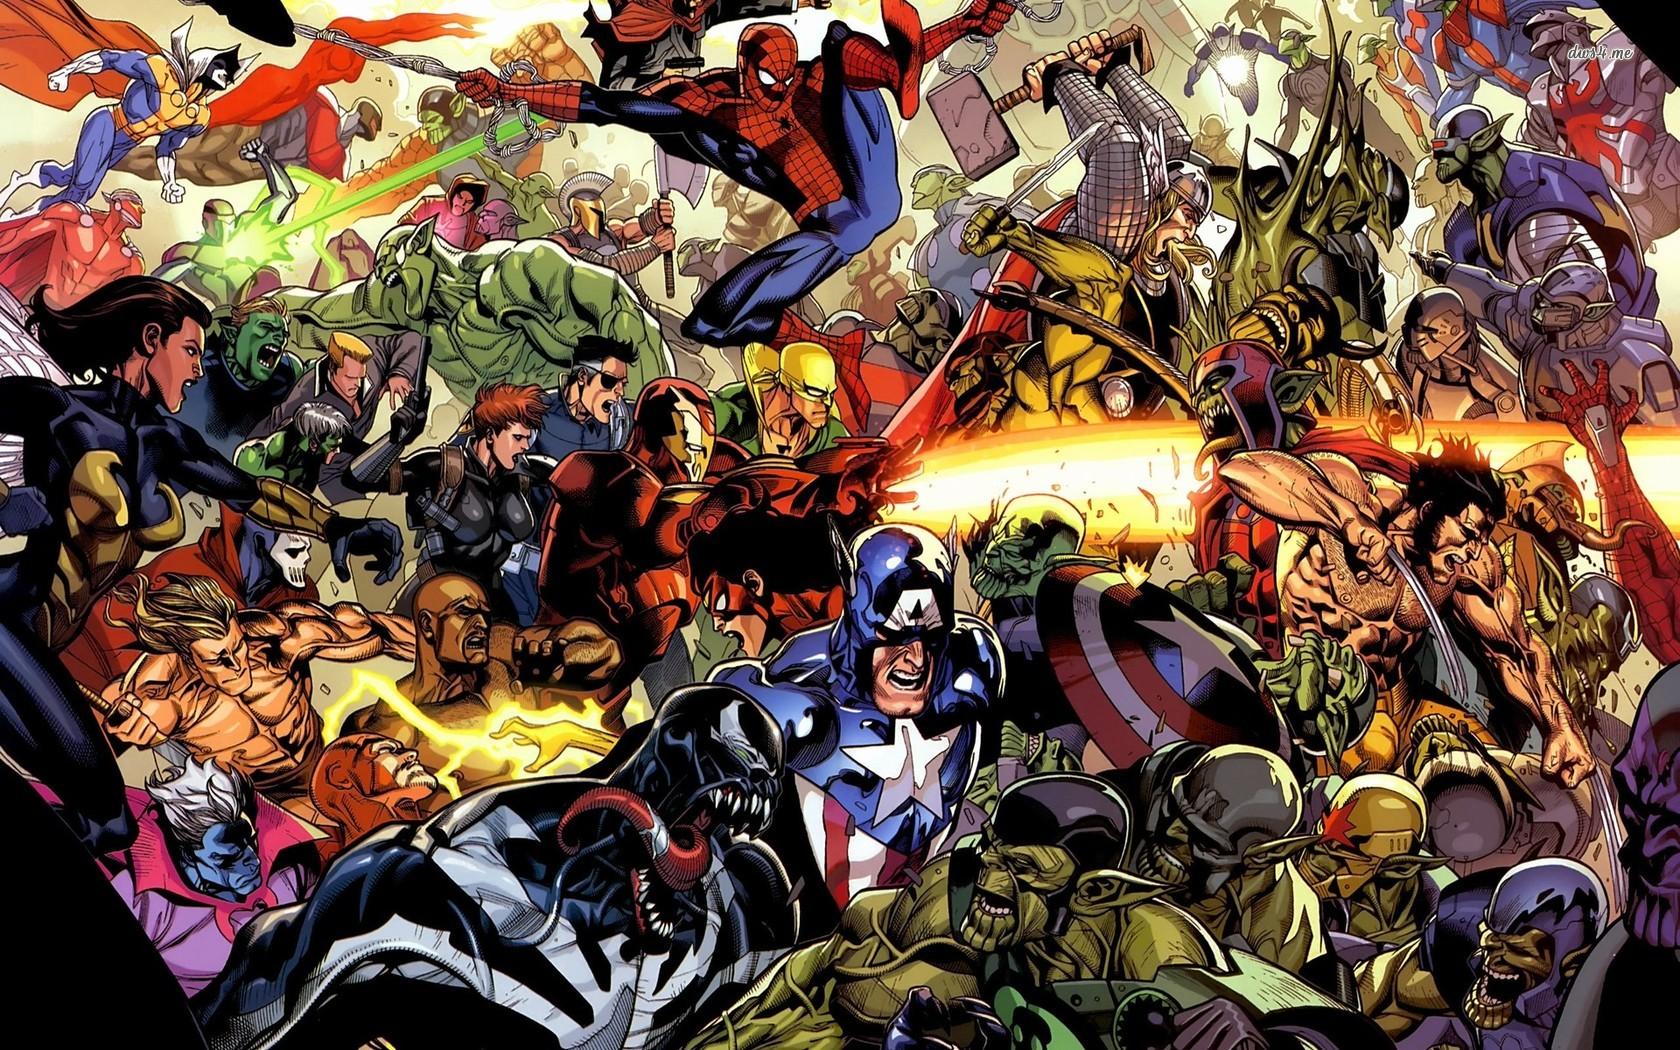 Marvel HD Wallpapers Best 4301 Wallpaper gamejetzcom 1680x1050